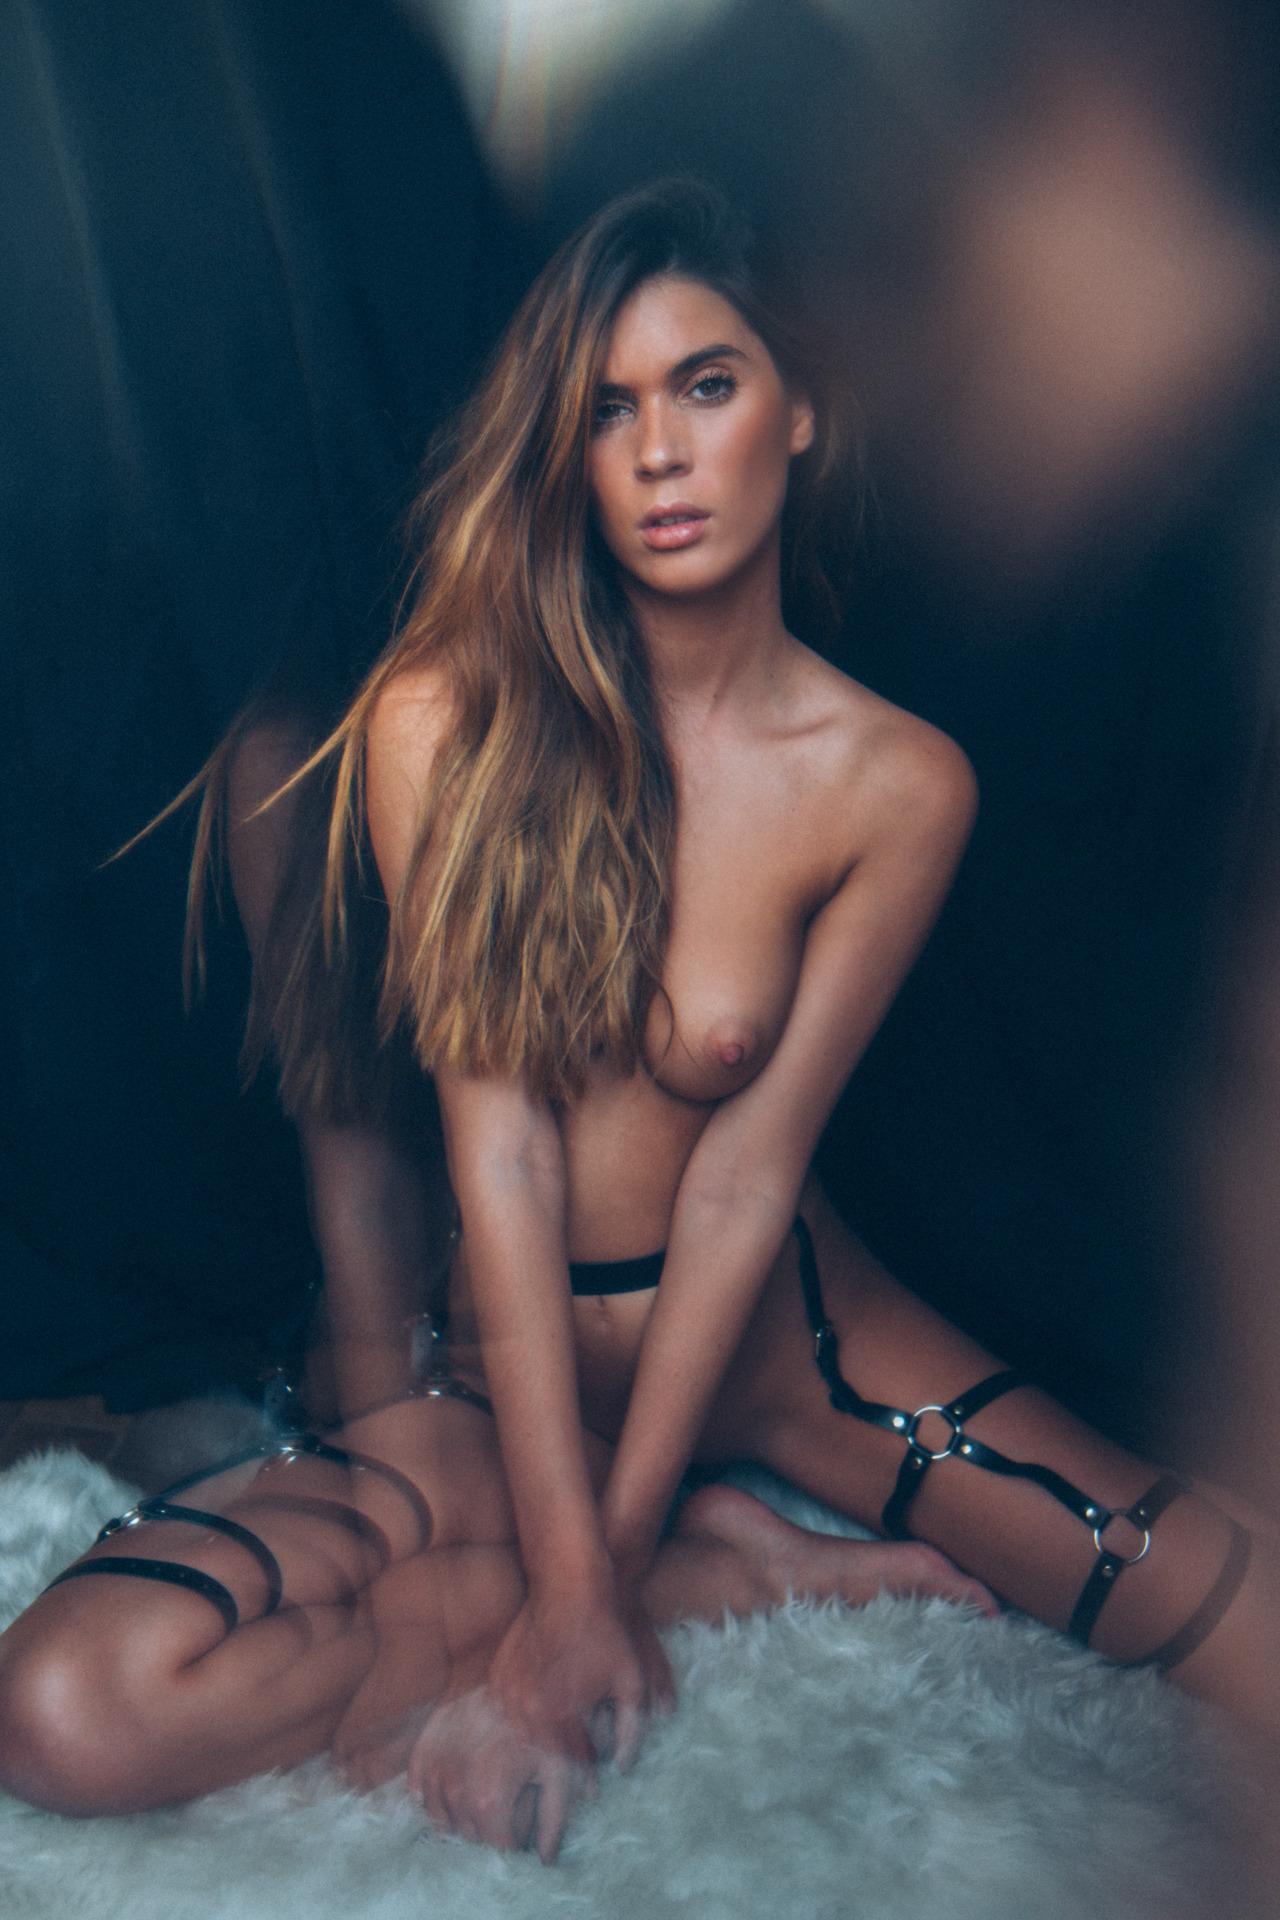 Angela Rei - Nicolas Larriere photoshoot